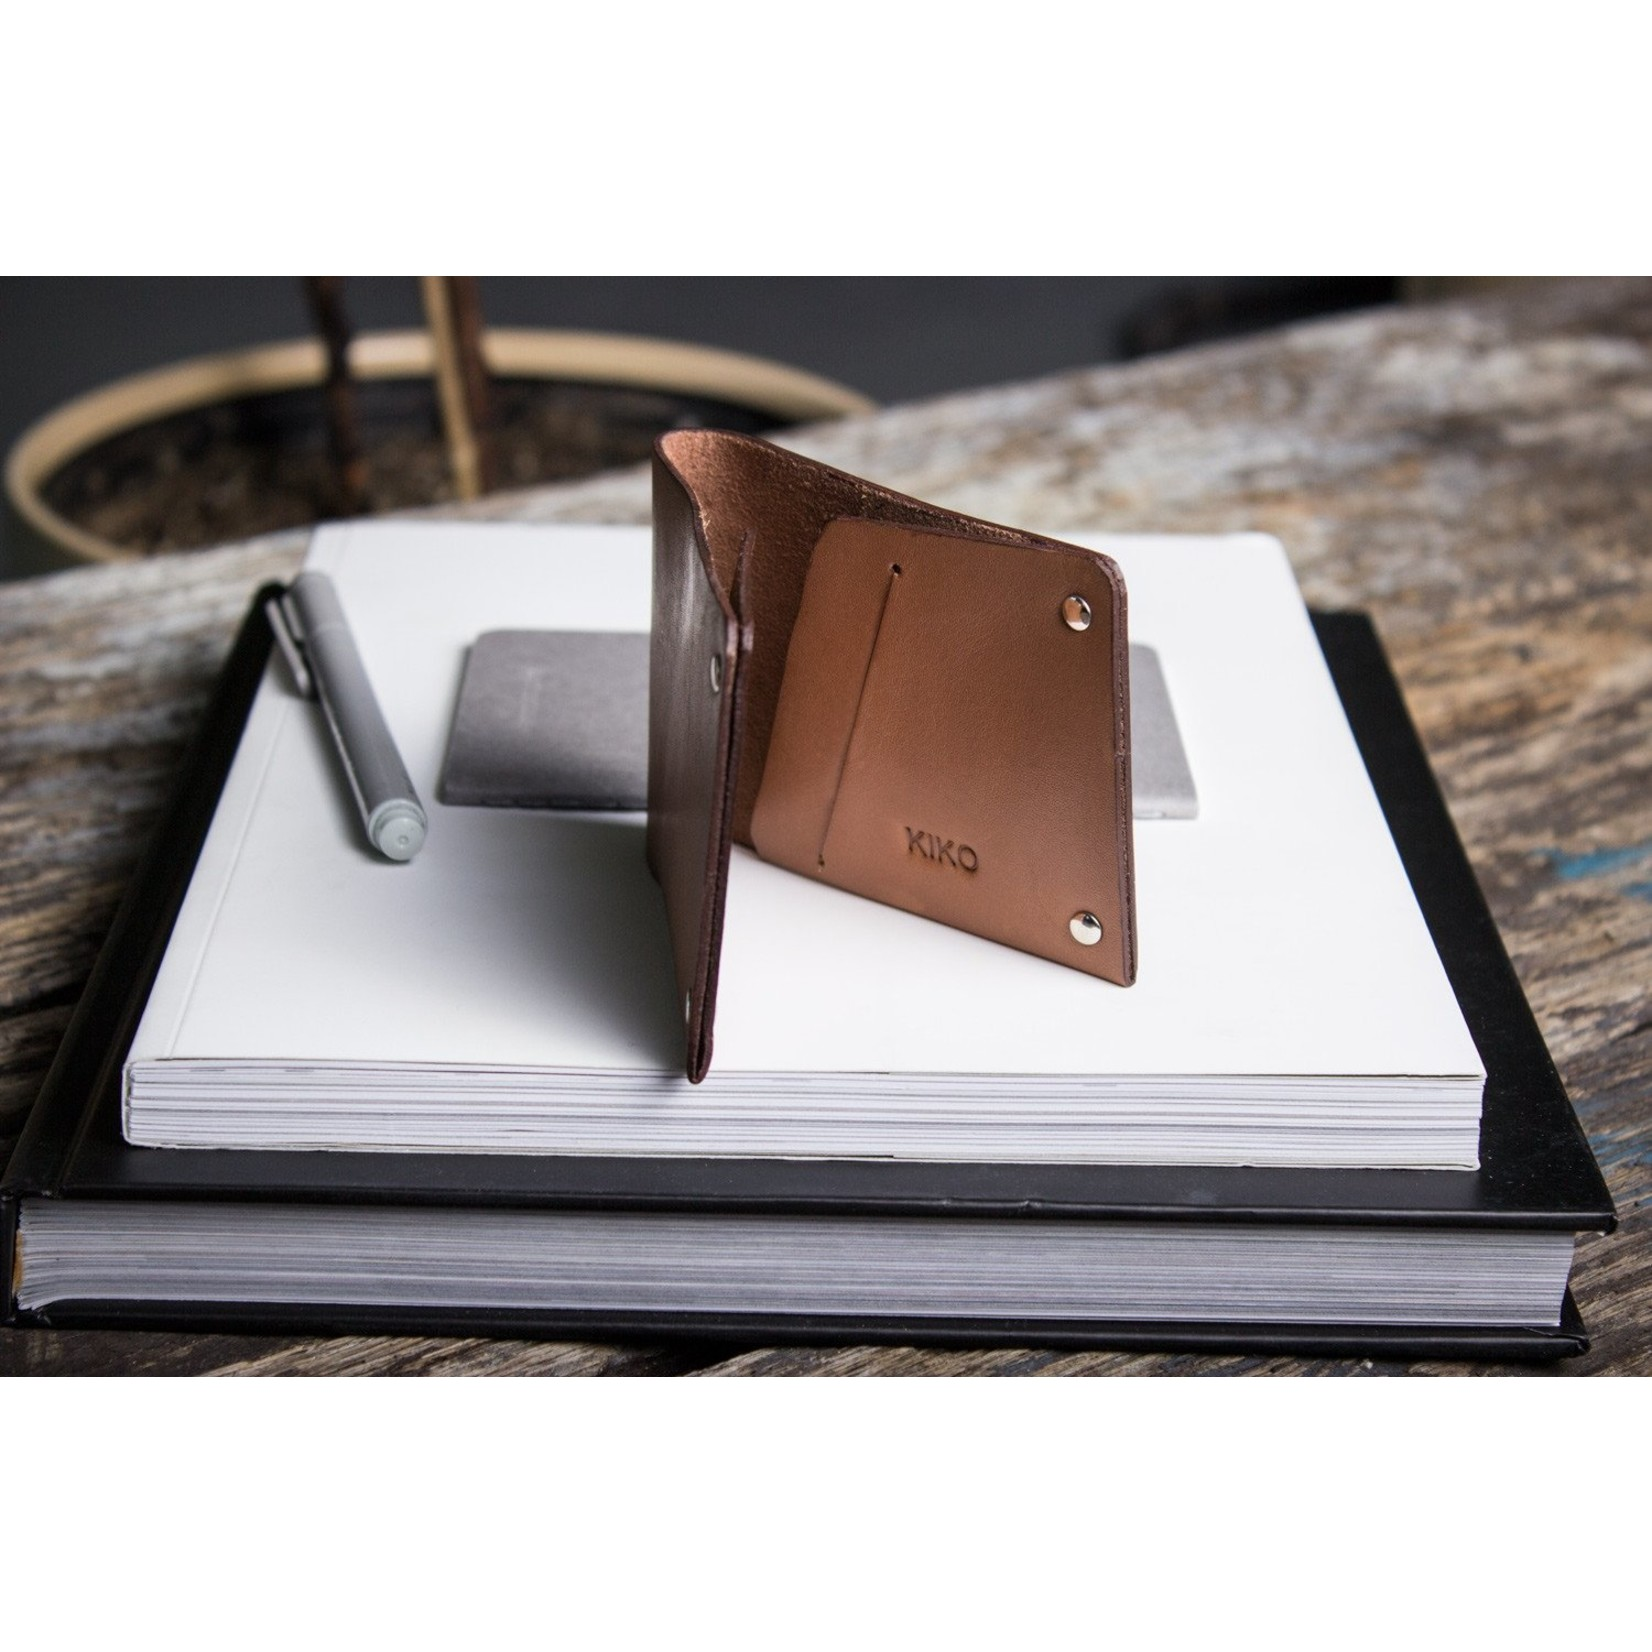 Kiko Leather Kiko Unstitched Billfold Wallet in Brown